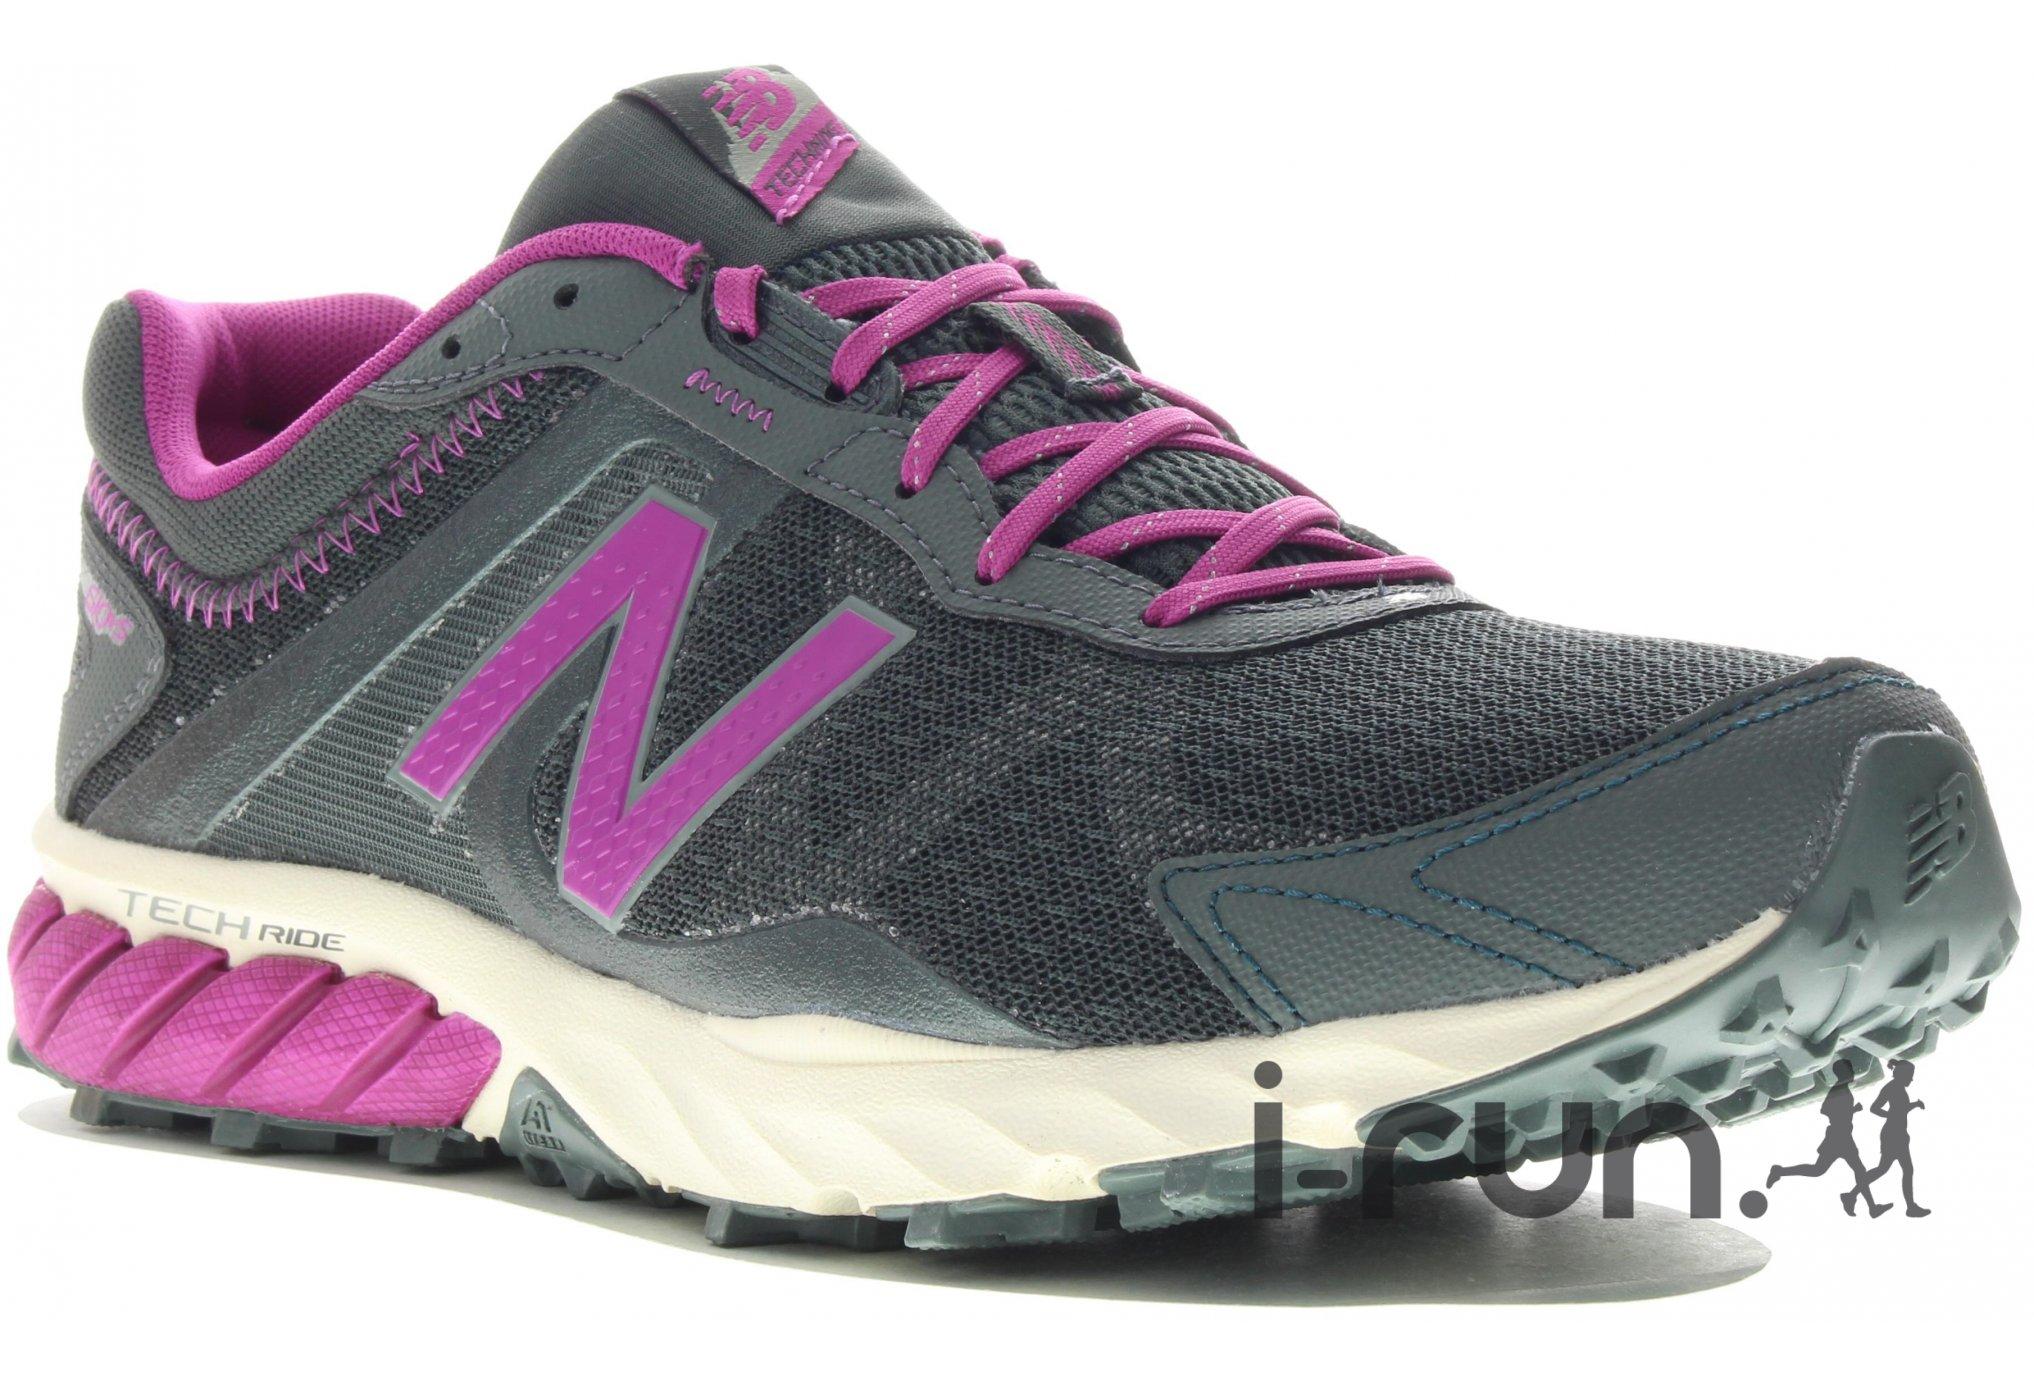 B Femme Raid New Aventure 690 Running Chaussures Wt Sénon Balance zqBYq4Sw